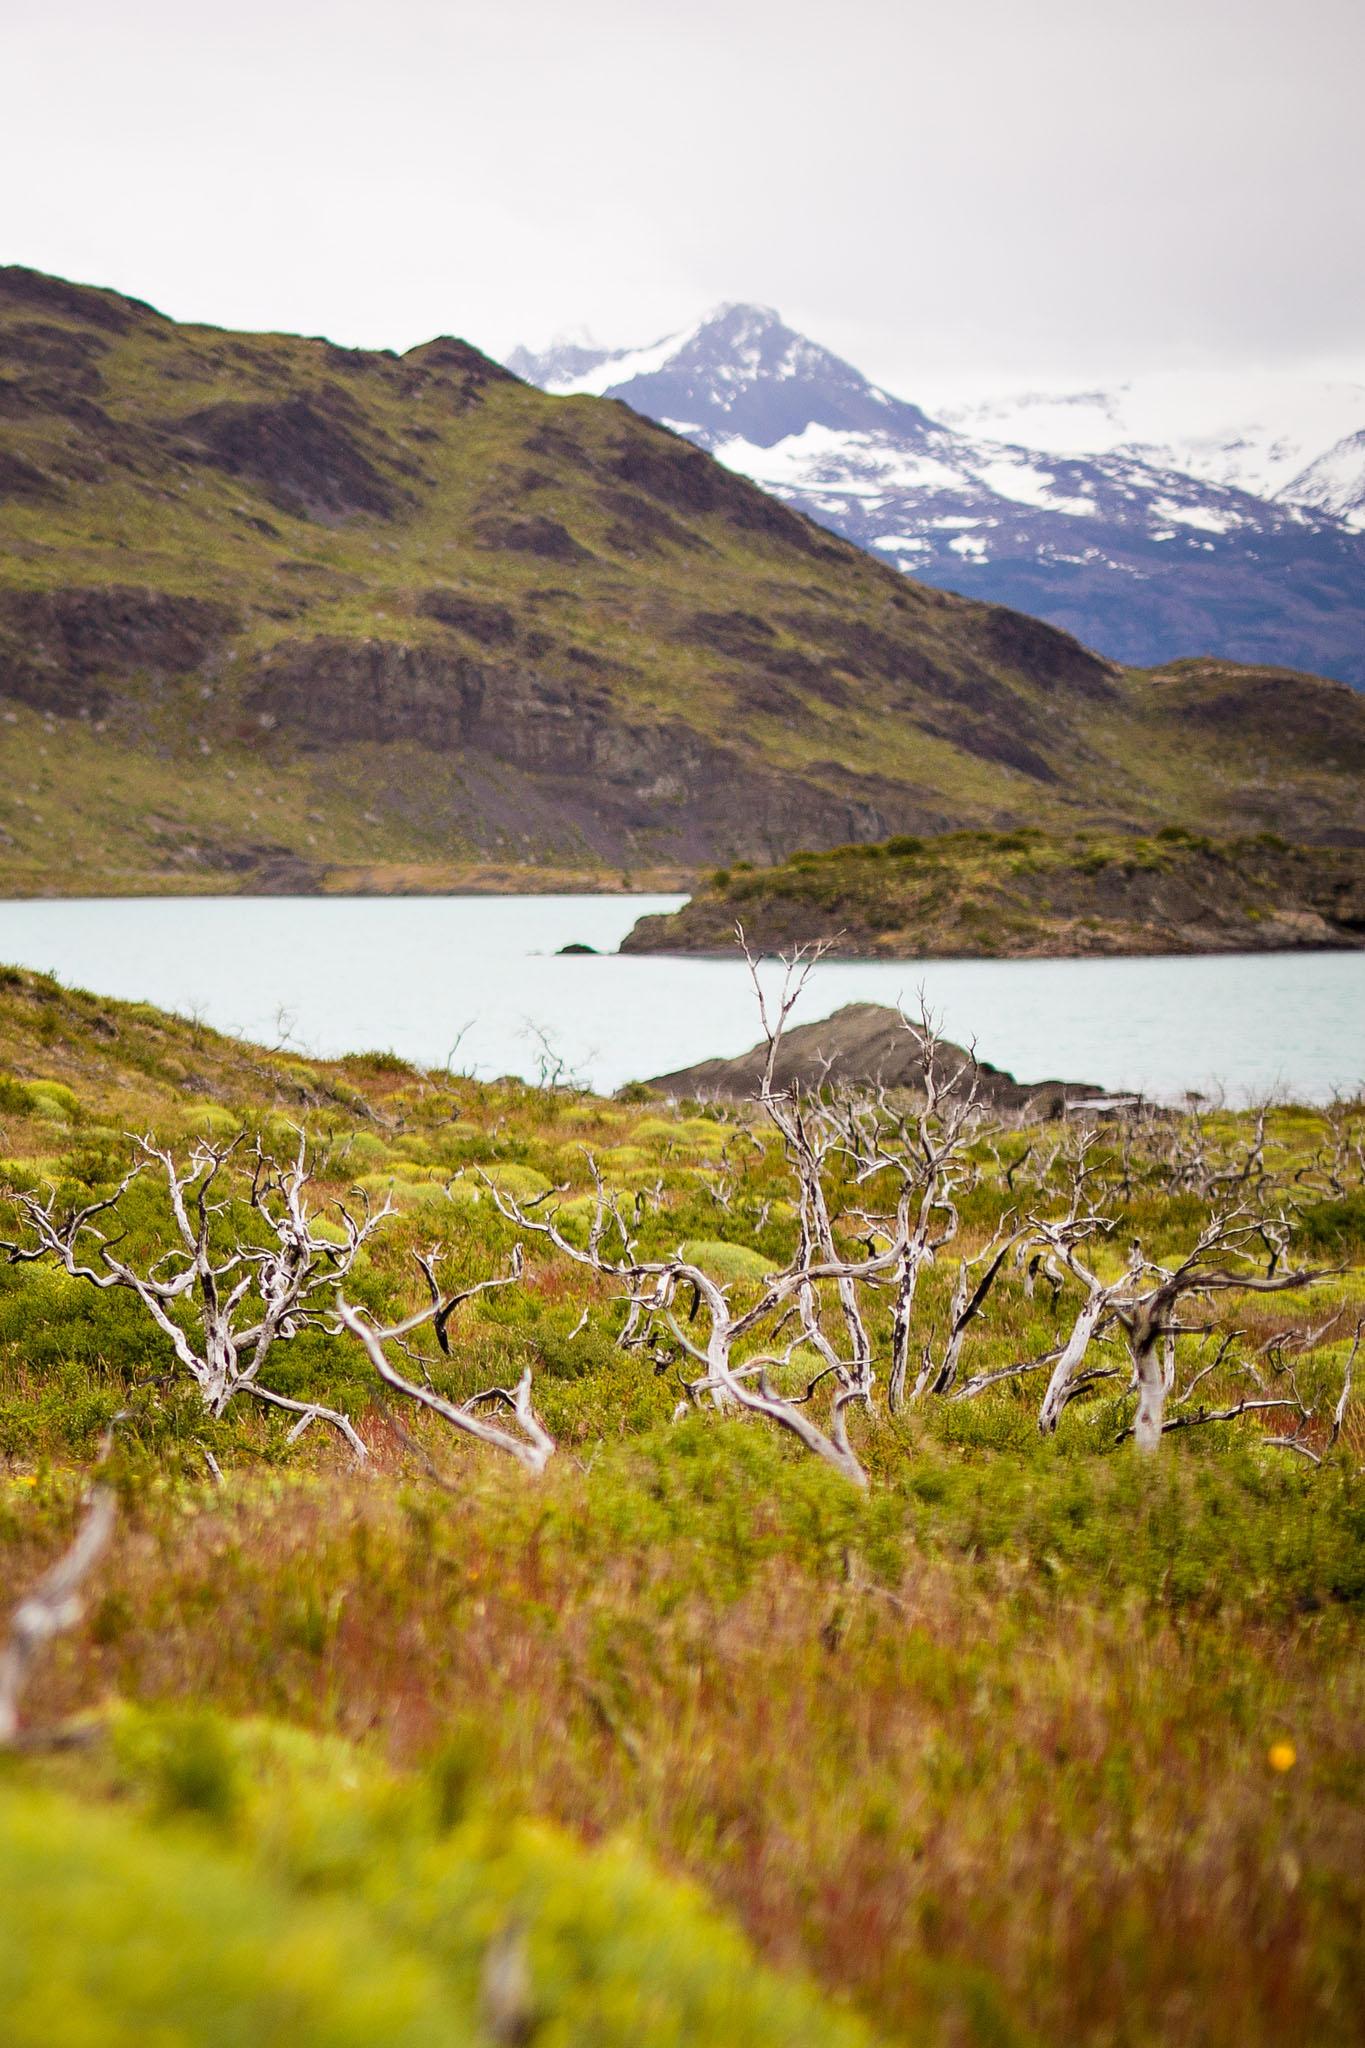 Wedding-Travellers-Overlanding-Destination-Wedding-Chile-Torres-del-Paine-fire-damage